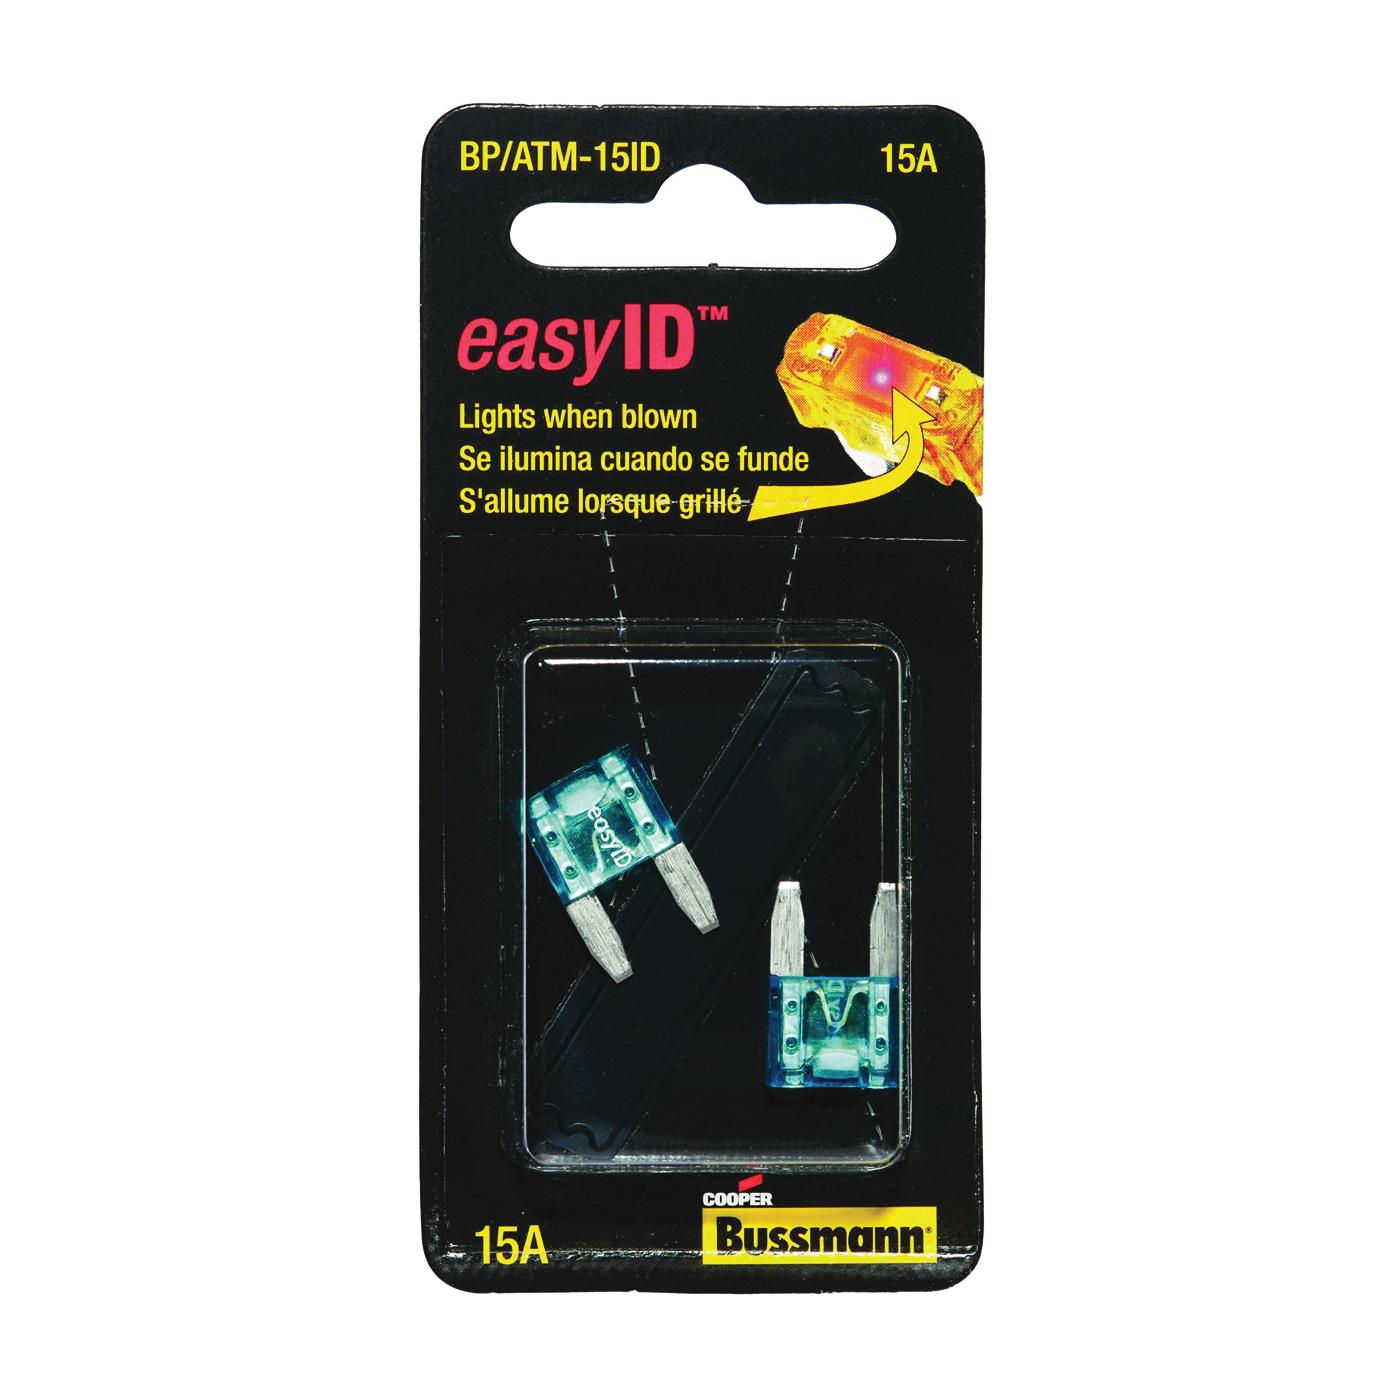 Picture of Bussmann BP/ATM-15ID Blade Fuse, 32 VDC, 15 A, 1 kA Interrupt